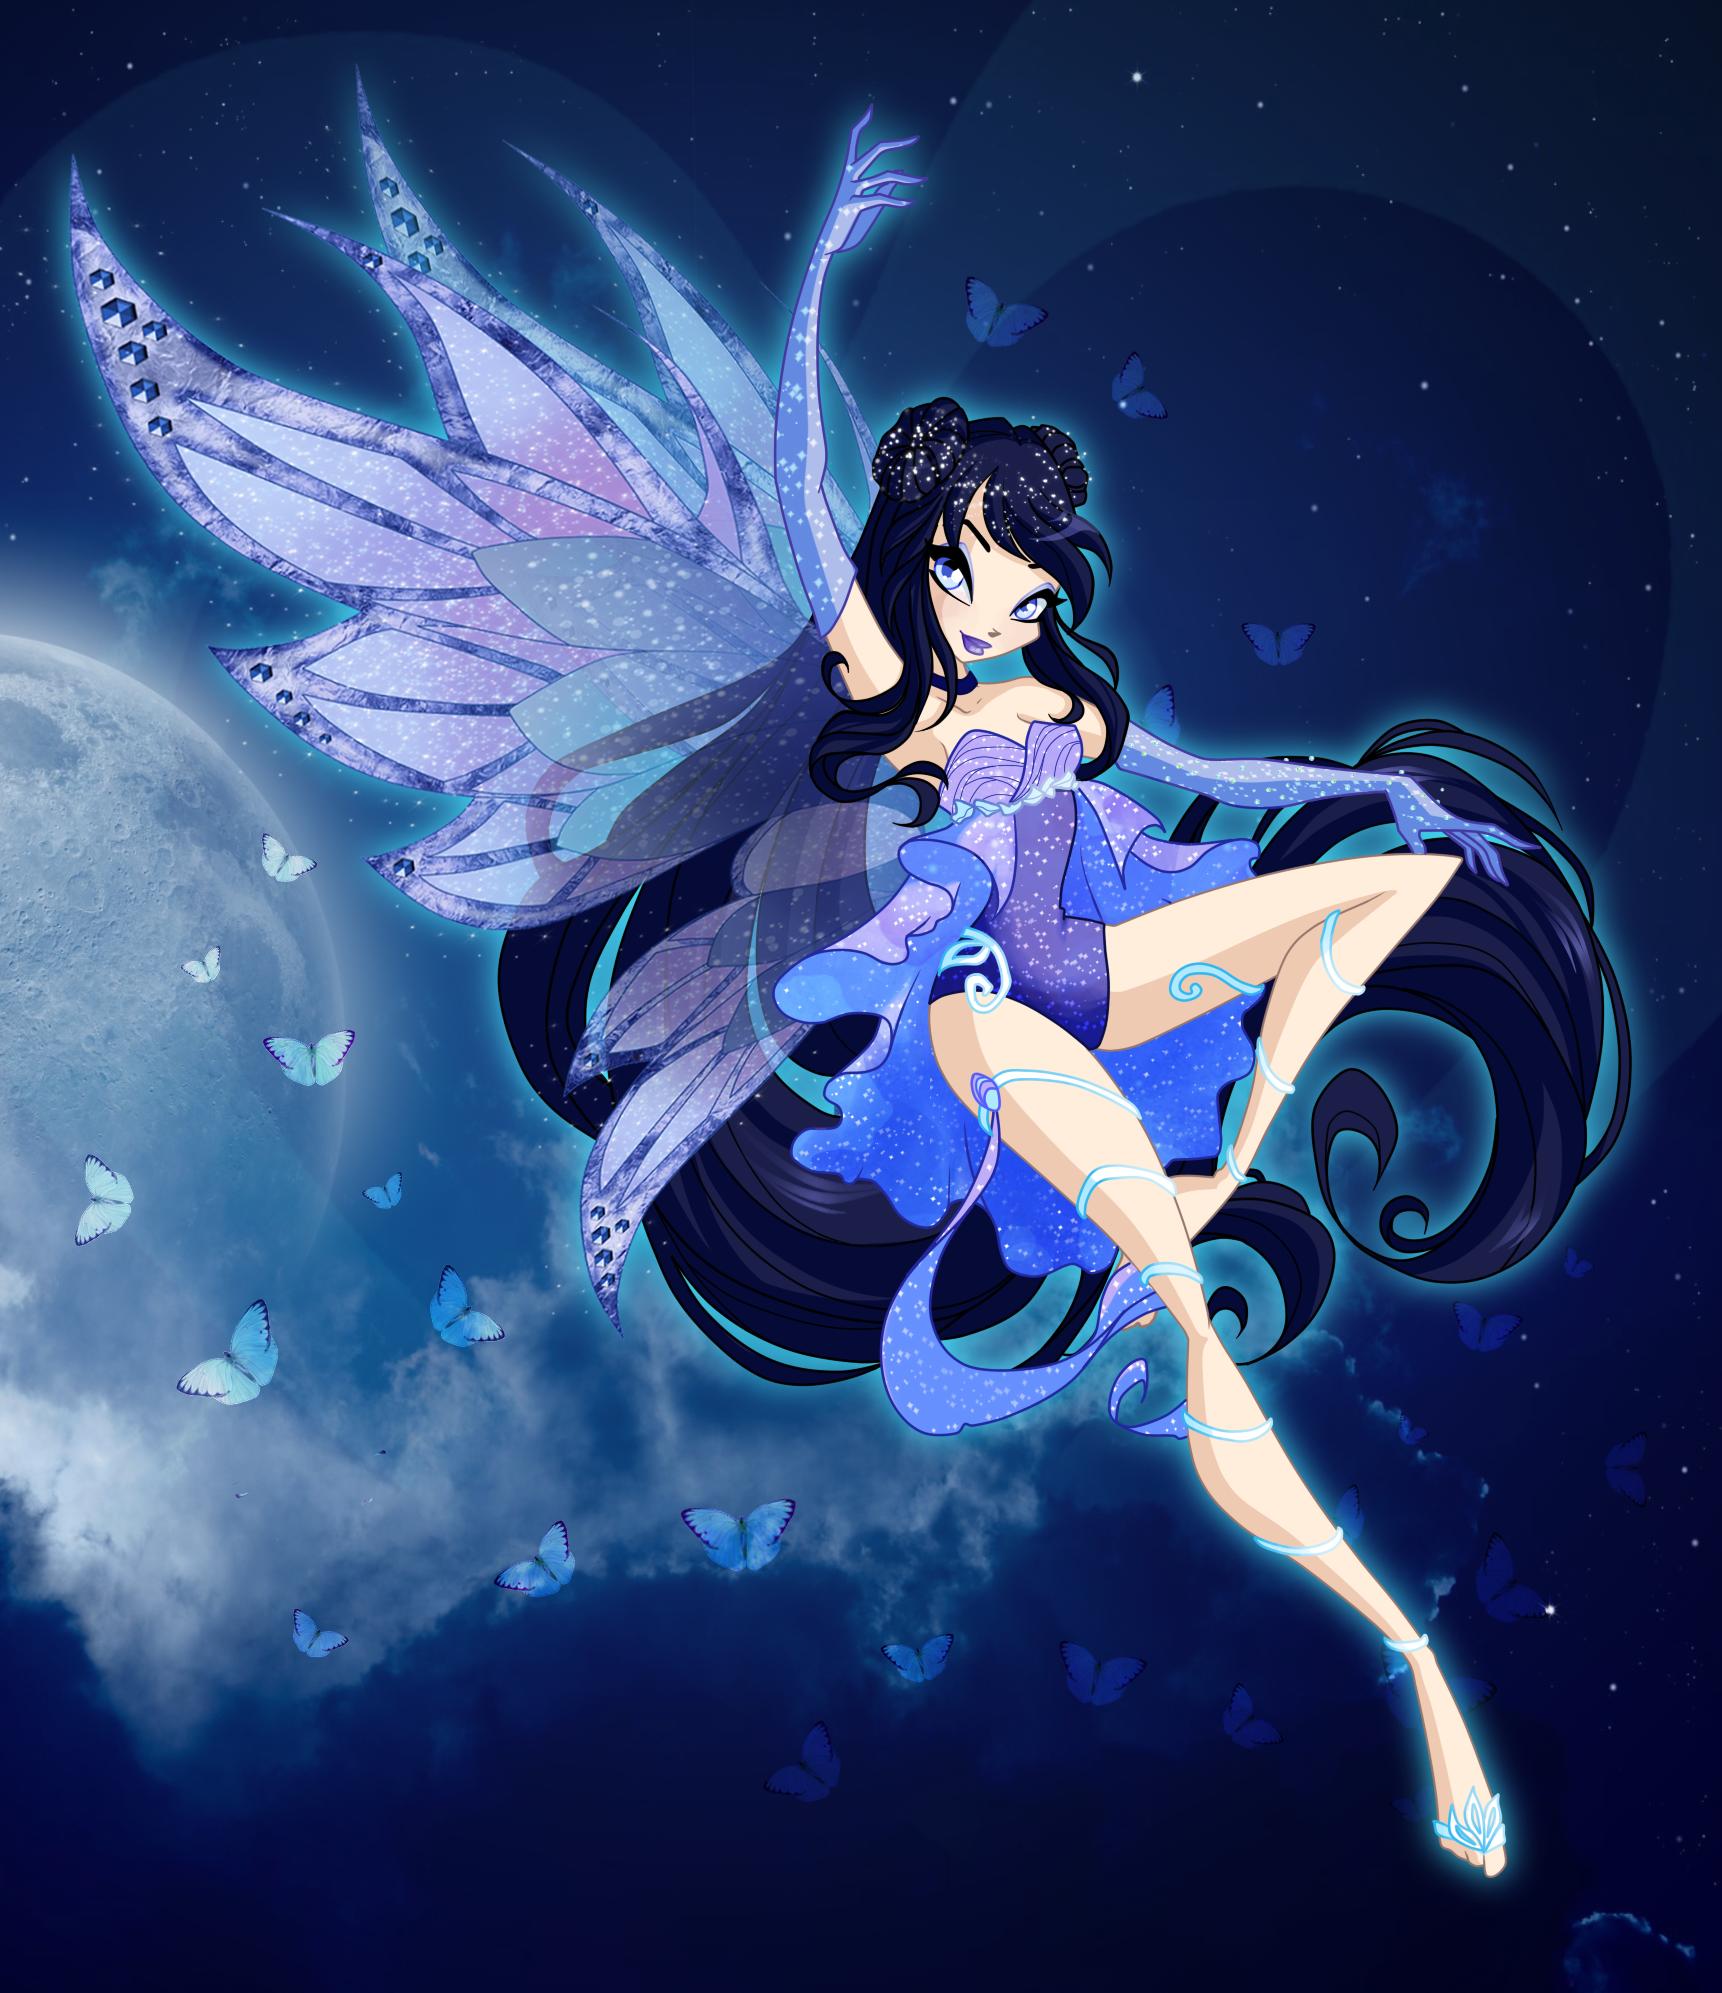 Pin by len🌻 on winx Anime furry, Club design, Anime oc